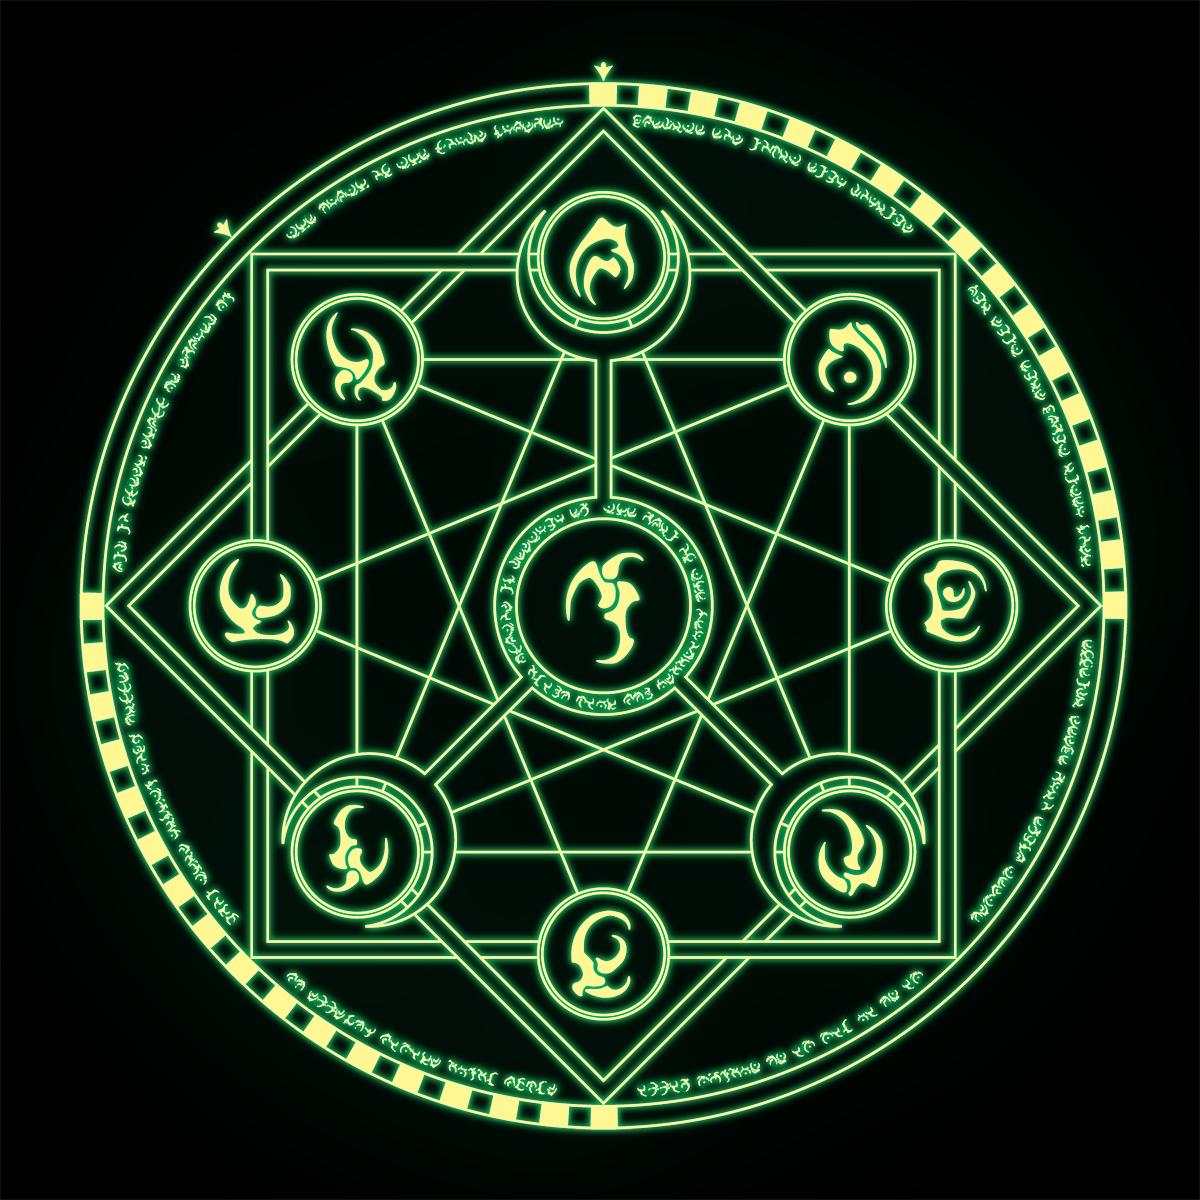 Magi Anime Wallpaper Propnomicon Magic Circle